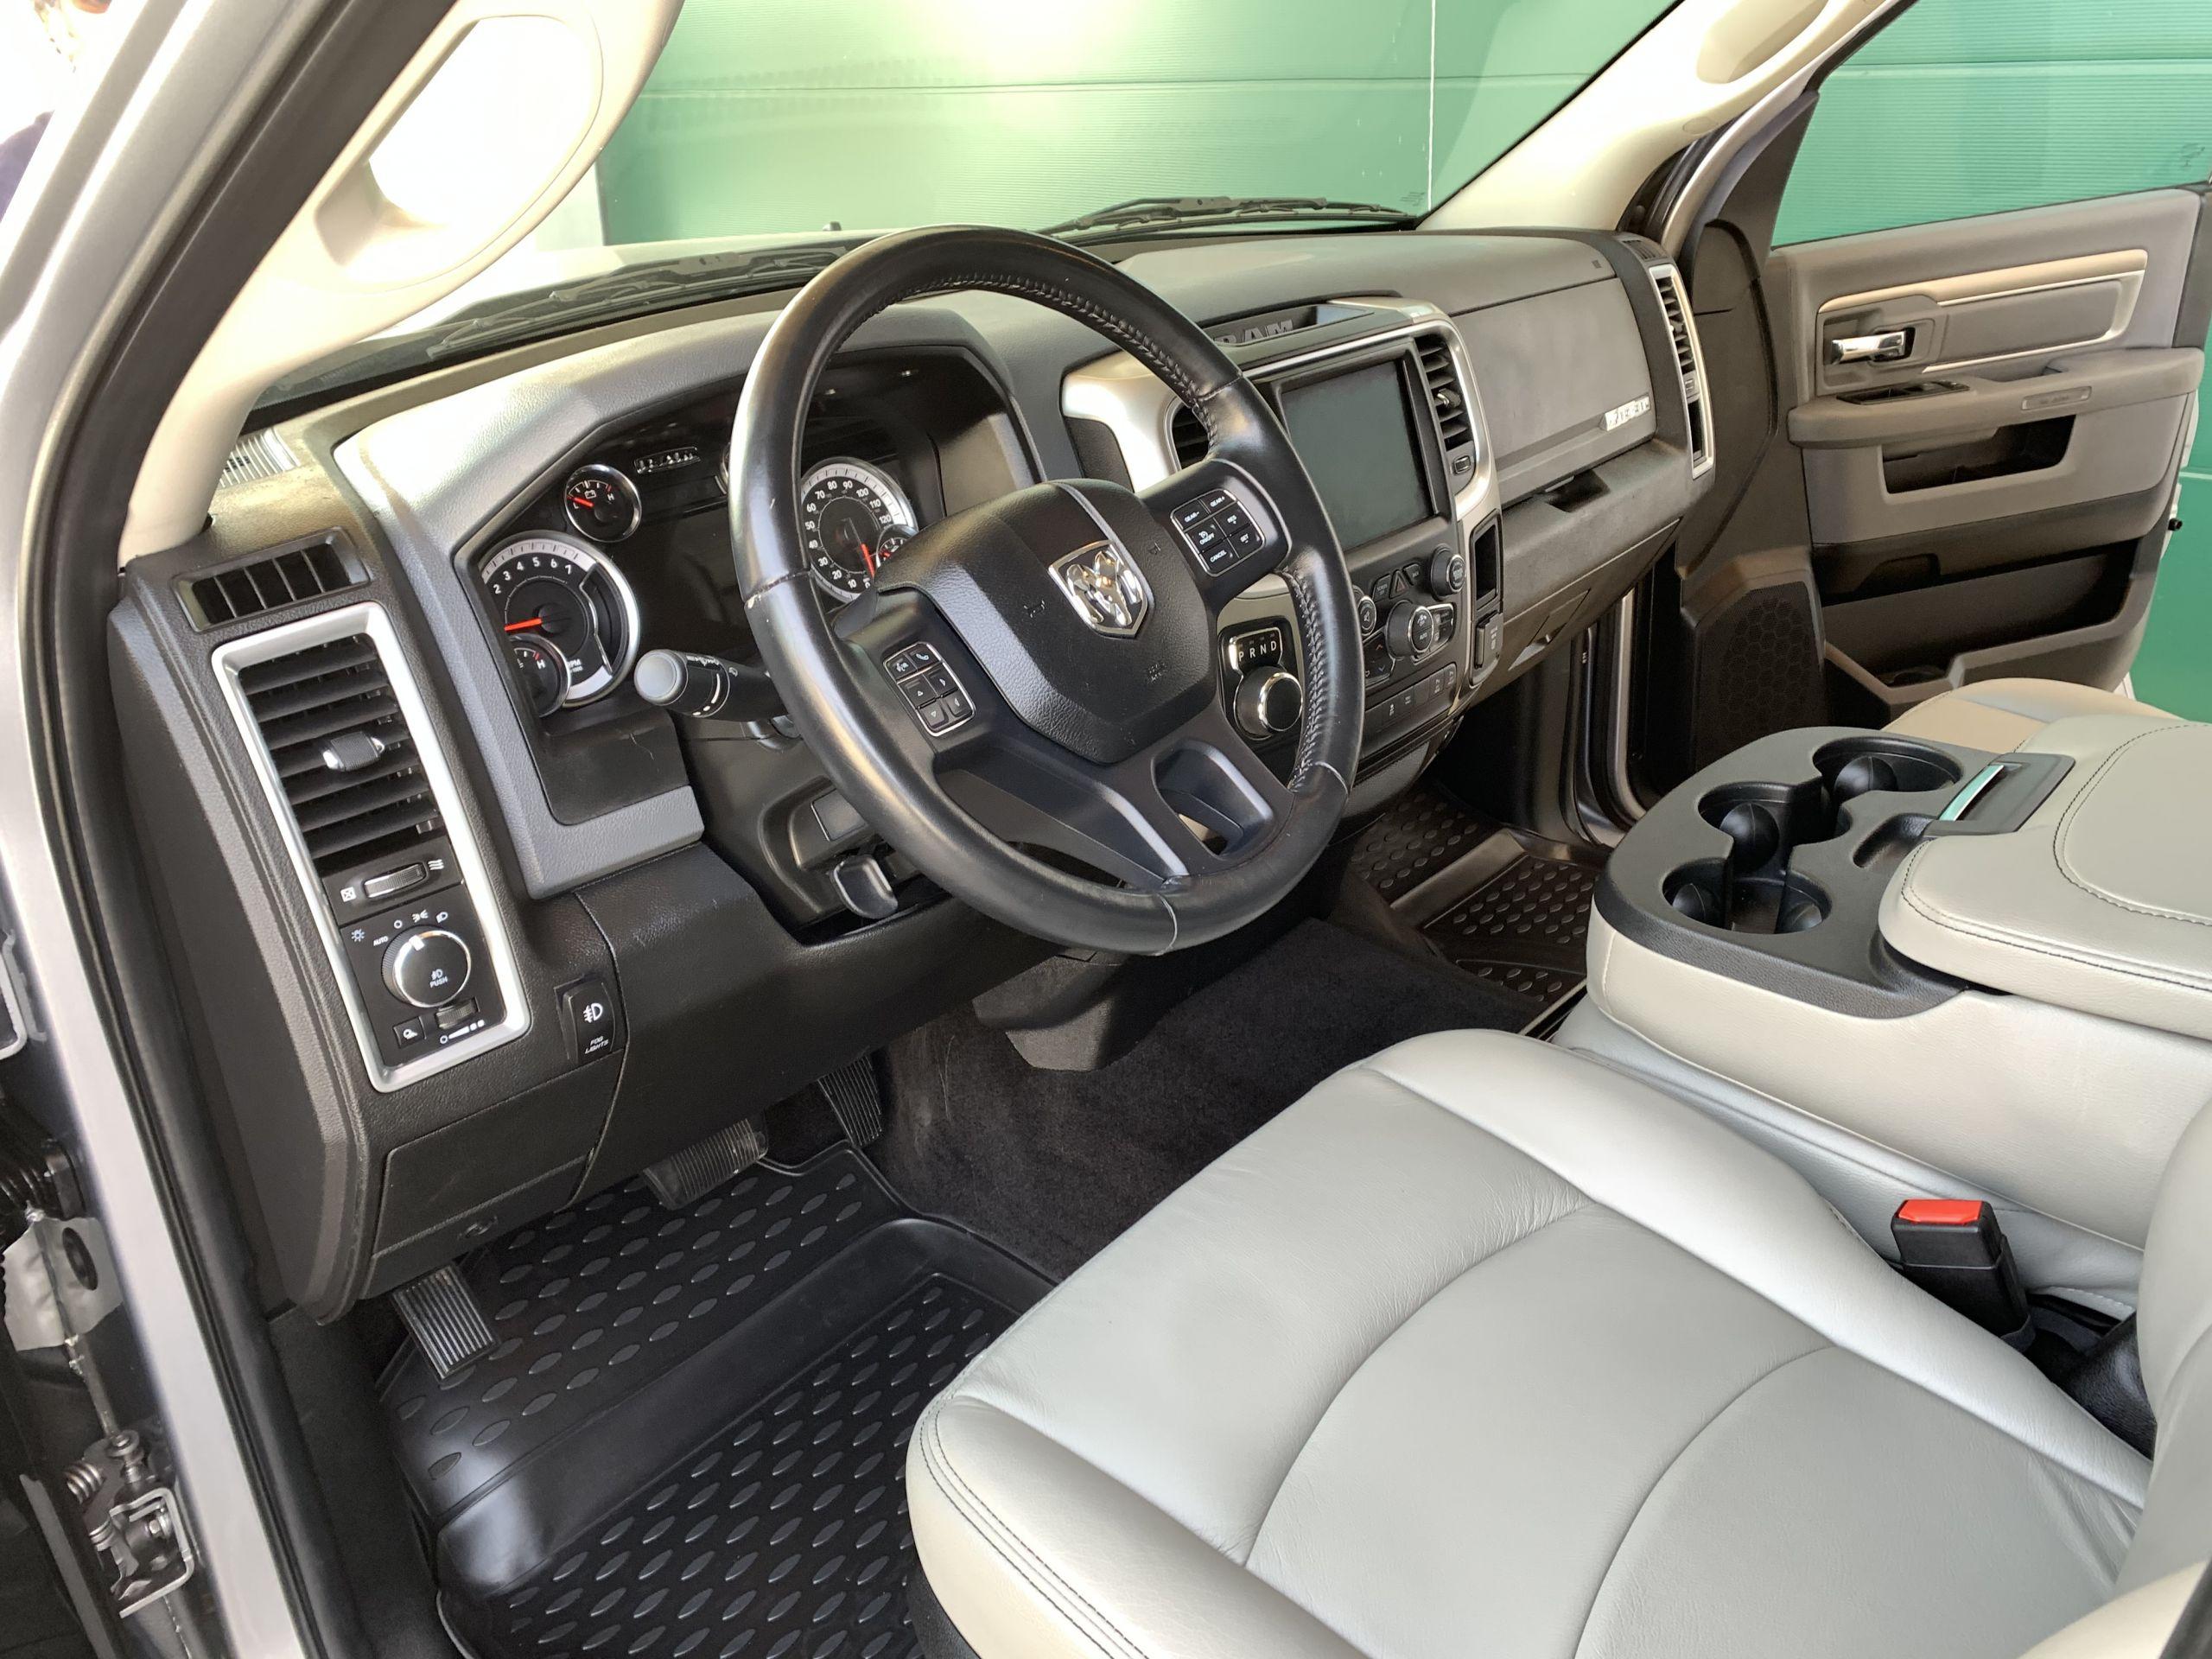 Dodge Ram 1500 SLT BIG HORN Crew Cab zu Verkaufen Schweiz